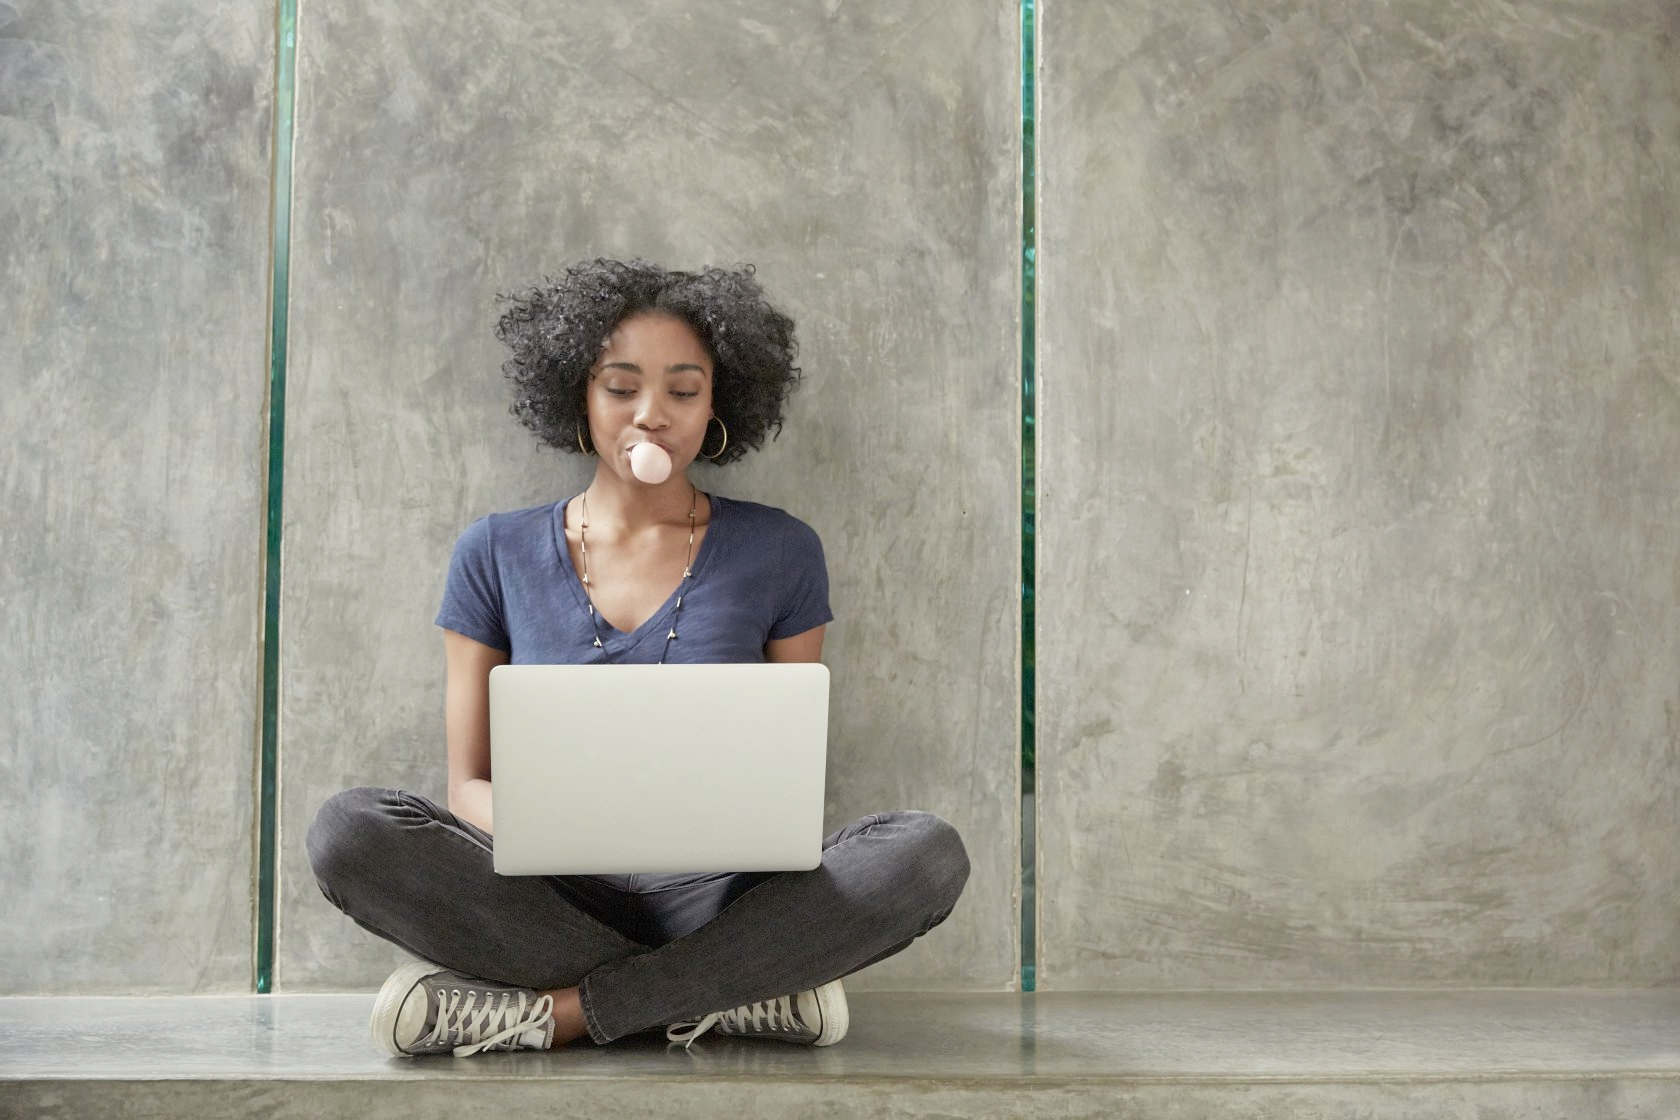 youngwomancomputer.jpg